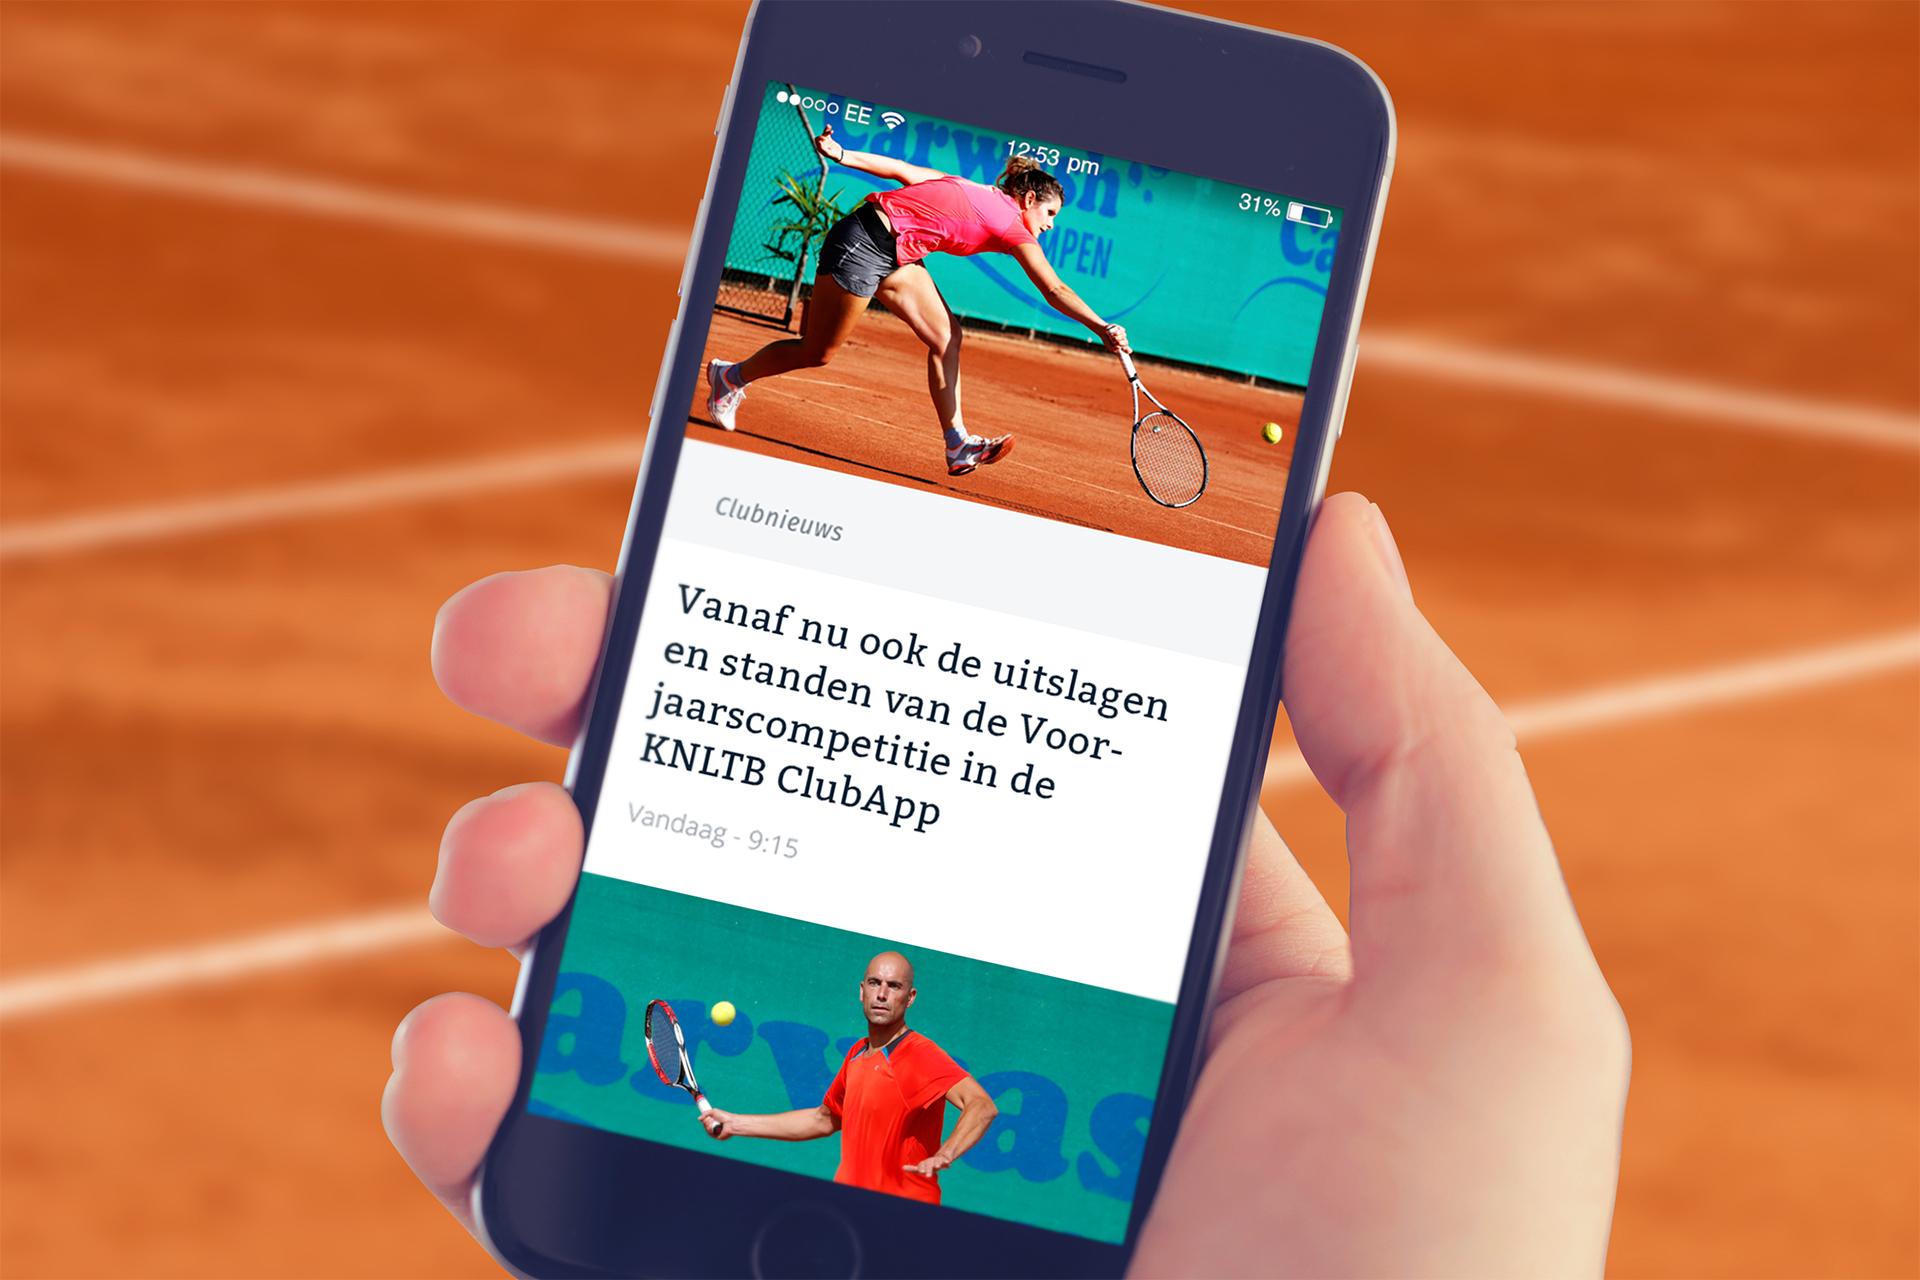 https://www.tcelburg.nl/wp-content/uploads/2021/01/tennisapp.jpg